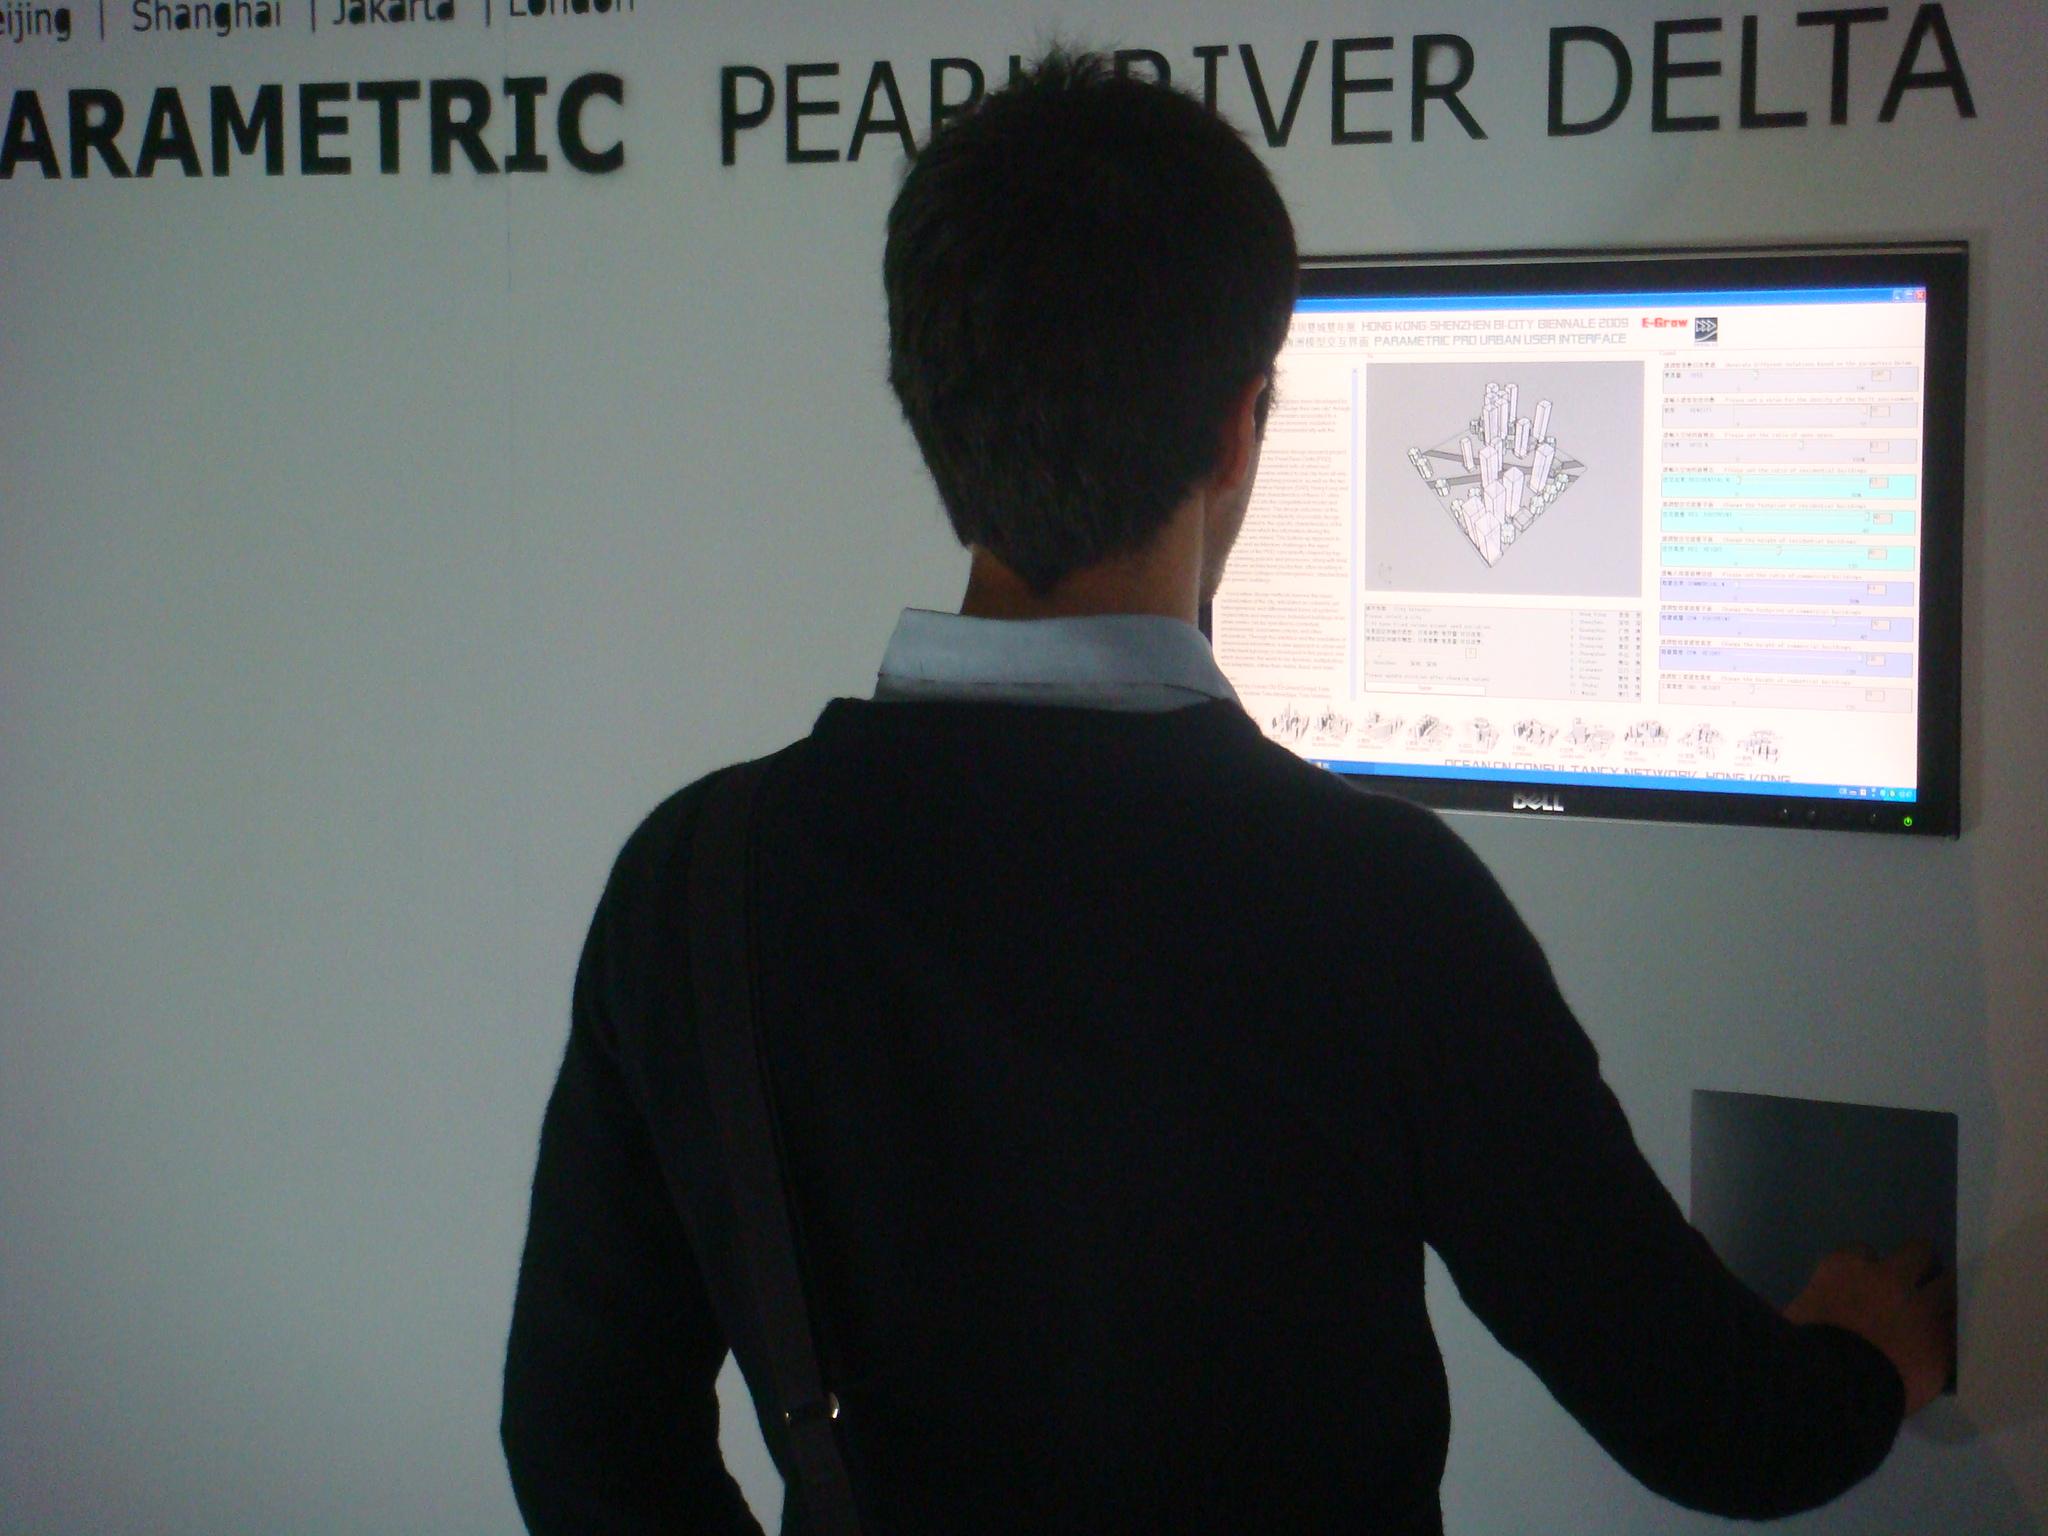 Parametric Pearl River Delta